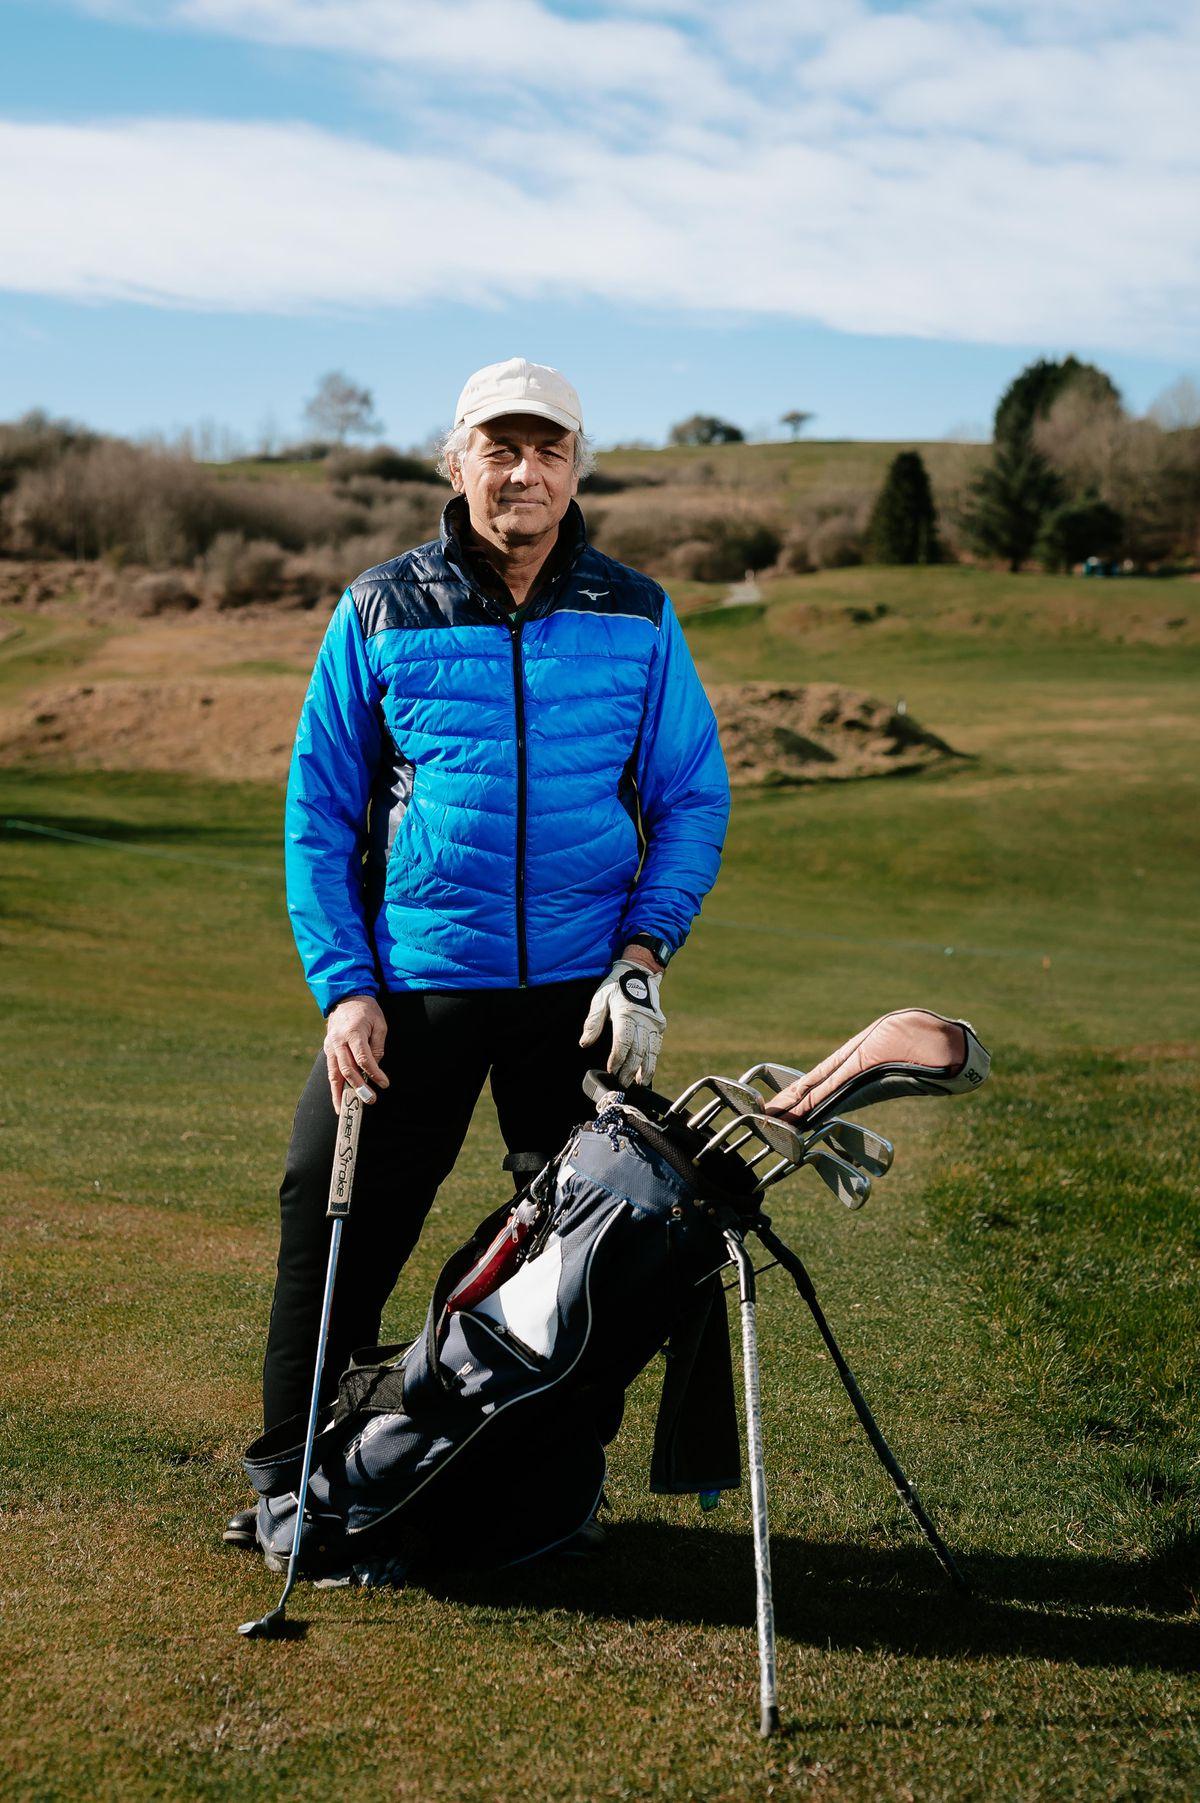 Llanymynech Golf Club member Satyajit Maitra enjoyed a solo game